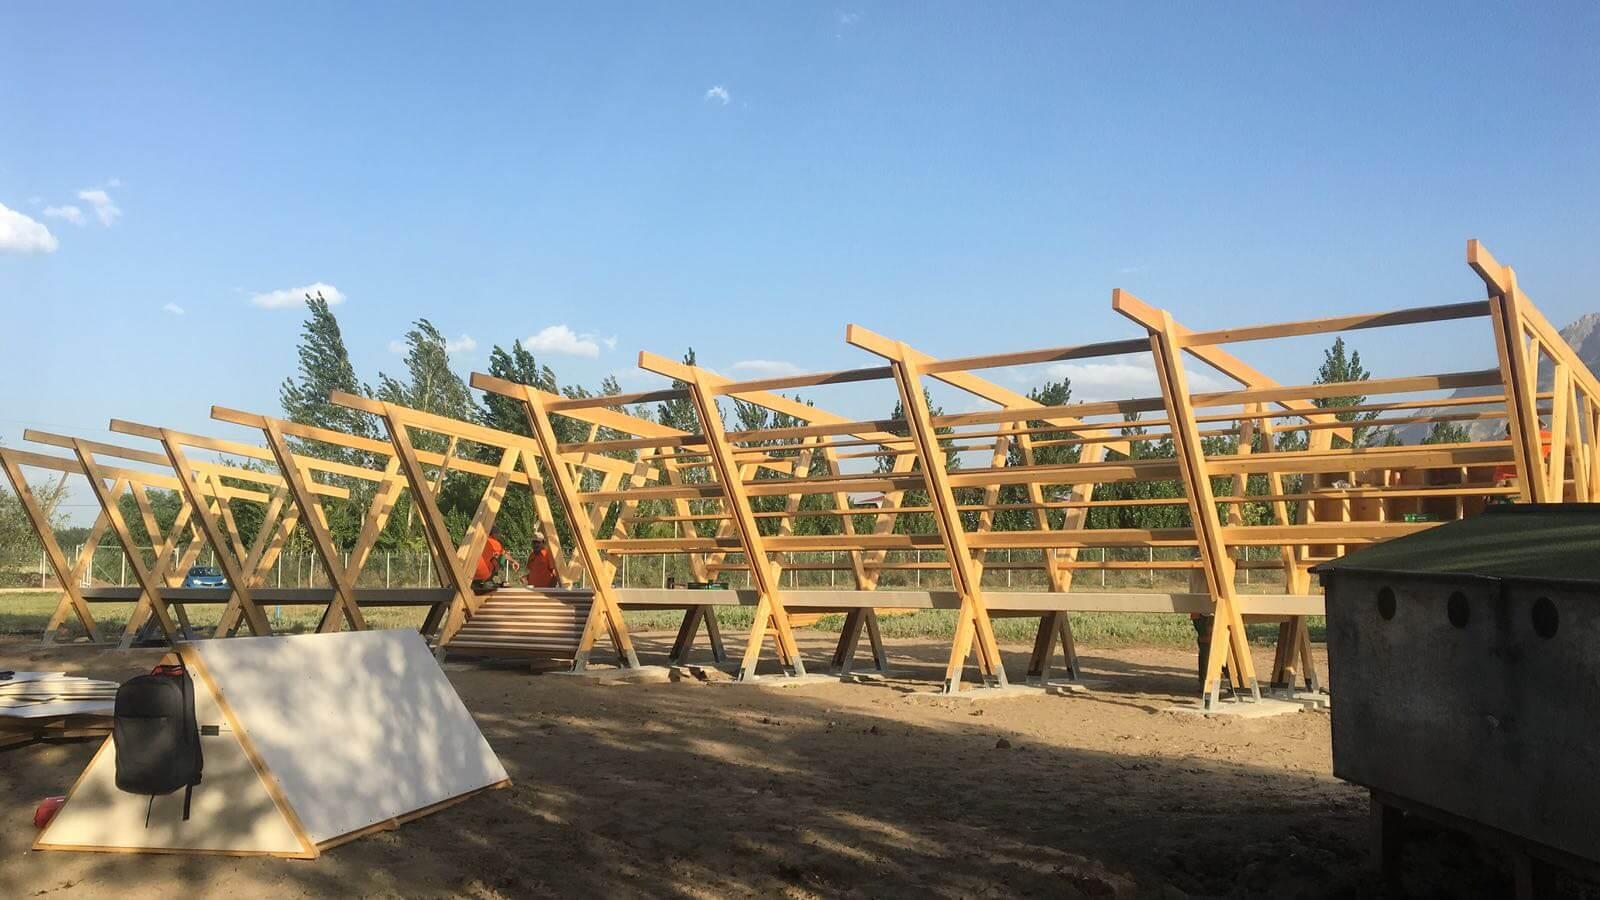 Palanga ve Tavukluk Projesi Erzincan